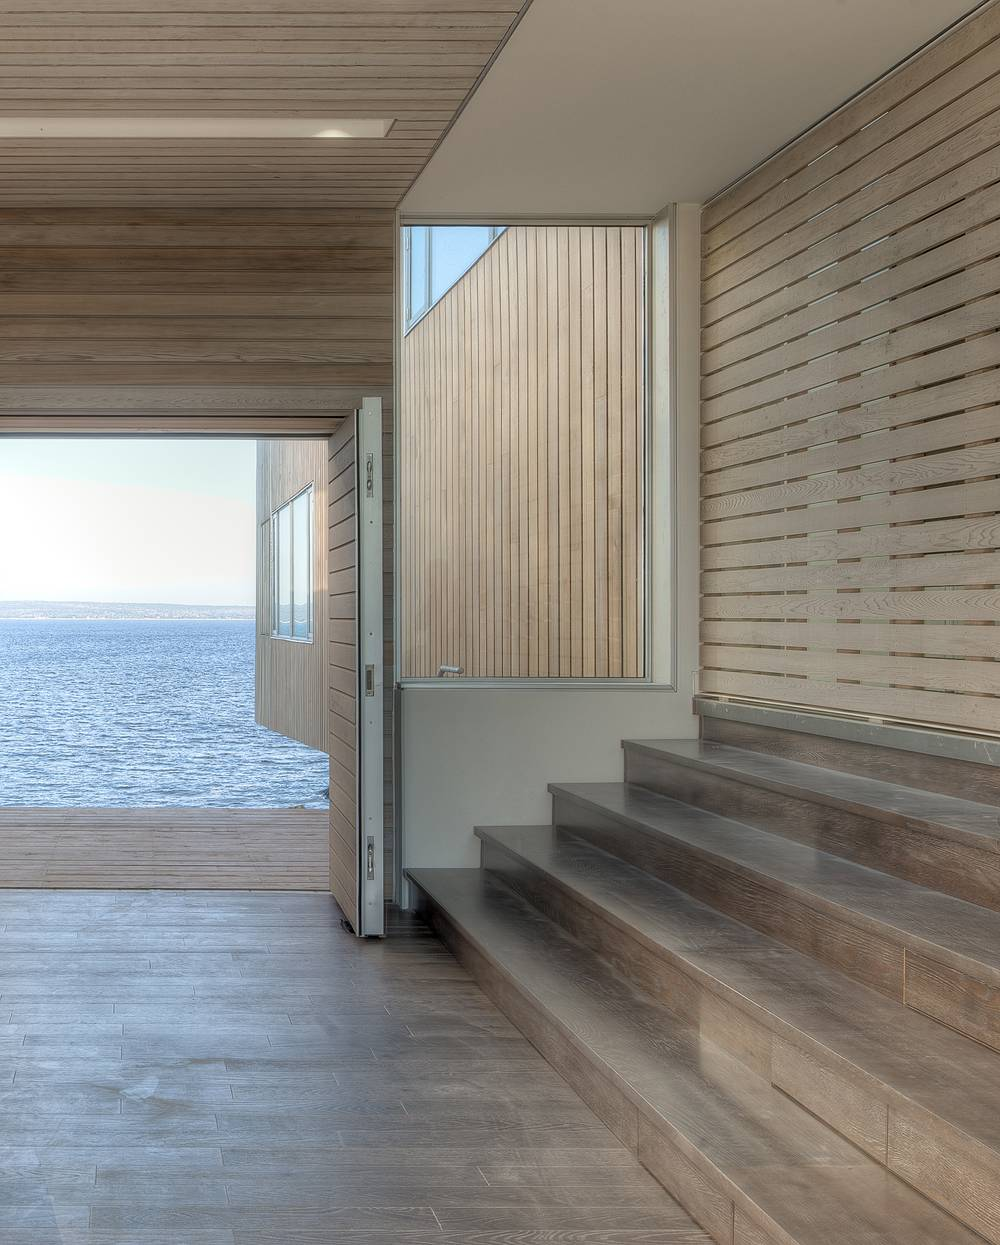 Wooden Flooring, Terrace, Home in Port Mouton, Nova Scotia